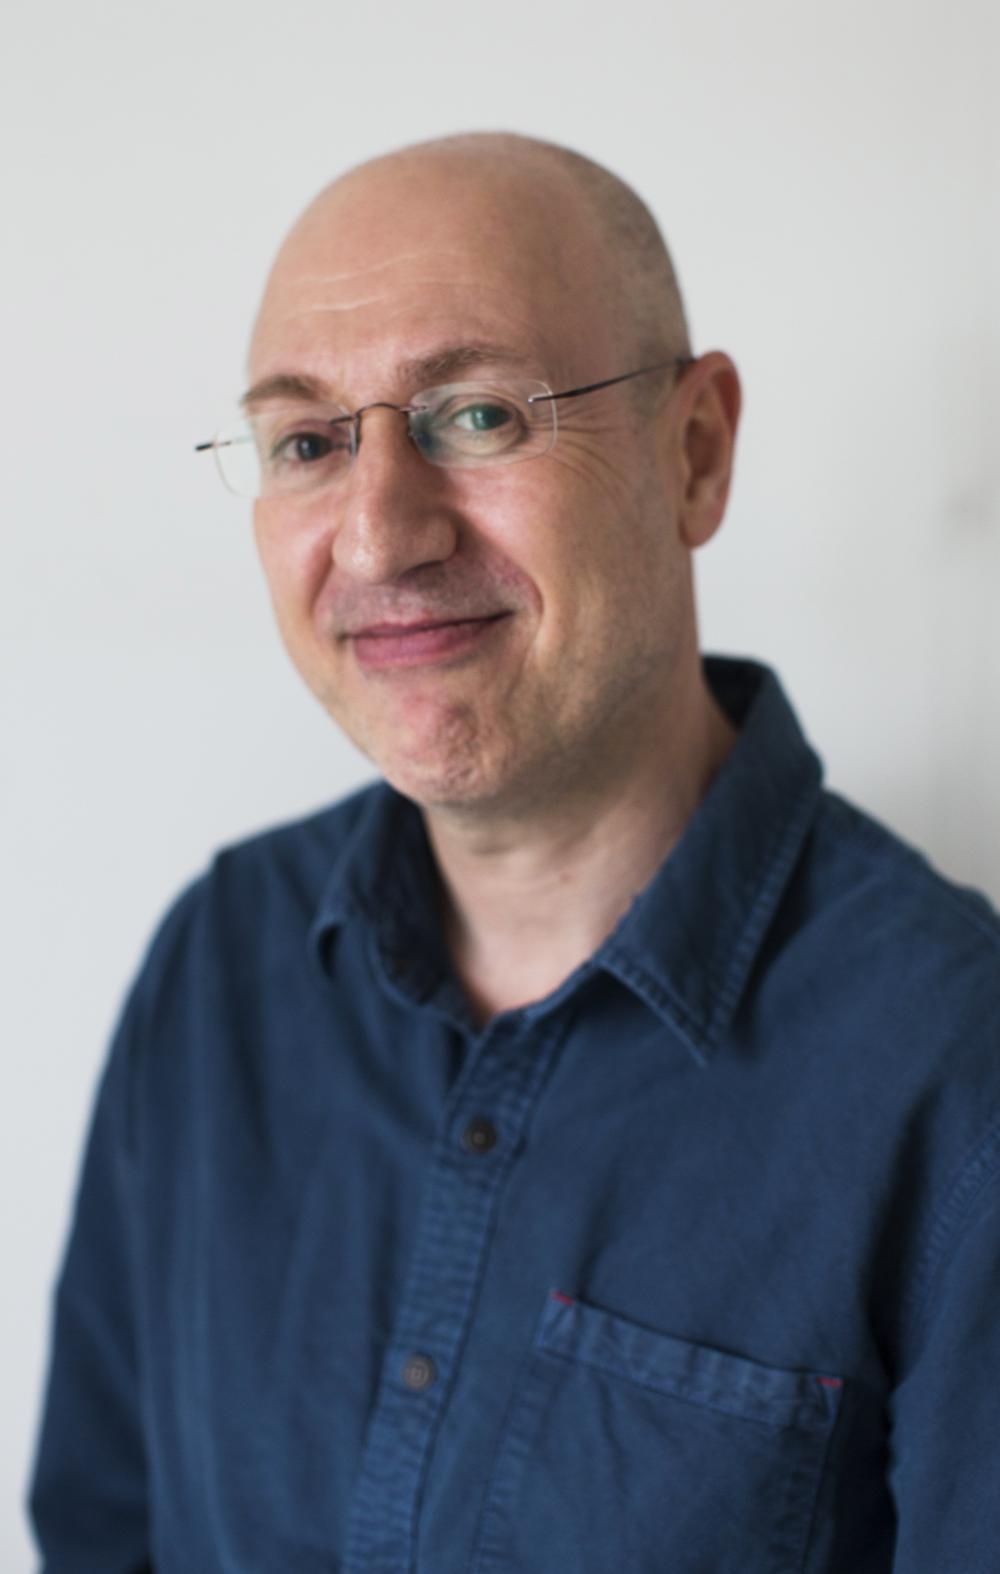 Author Ivan D. Wainewright